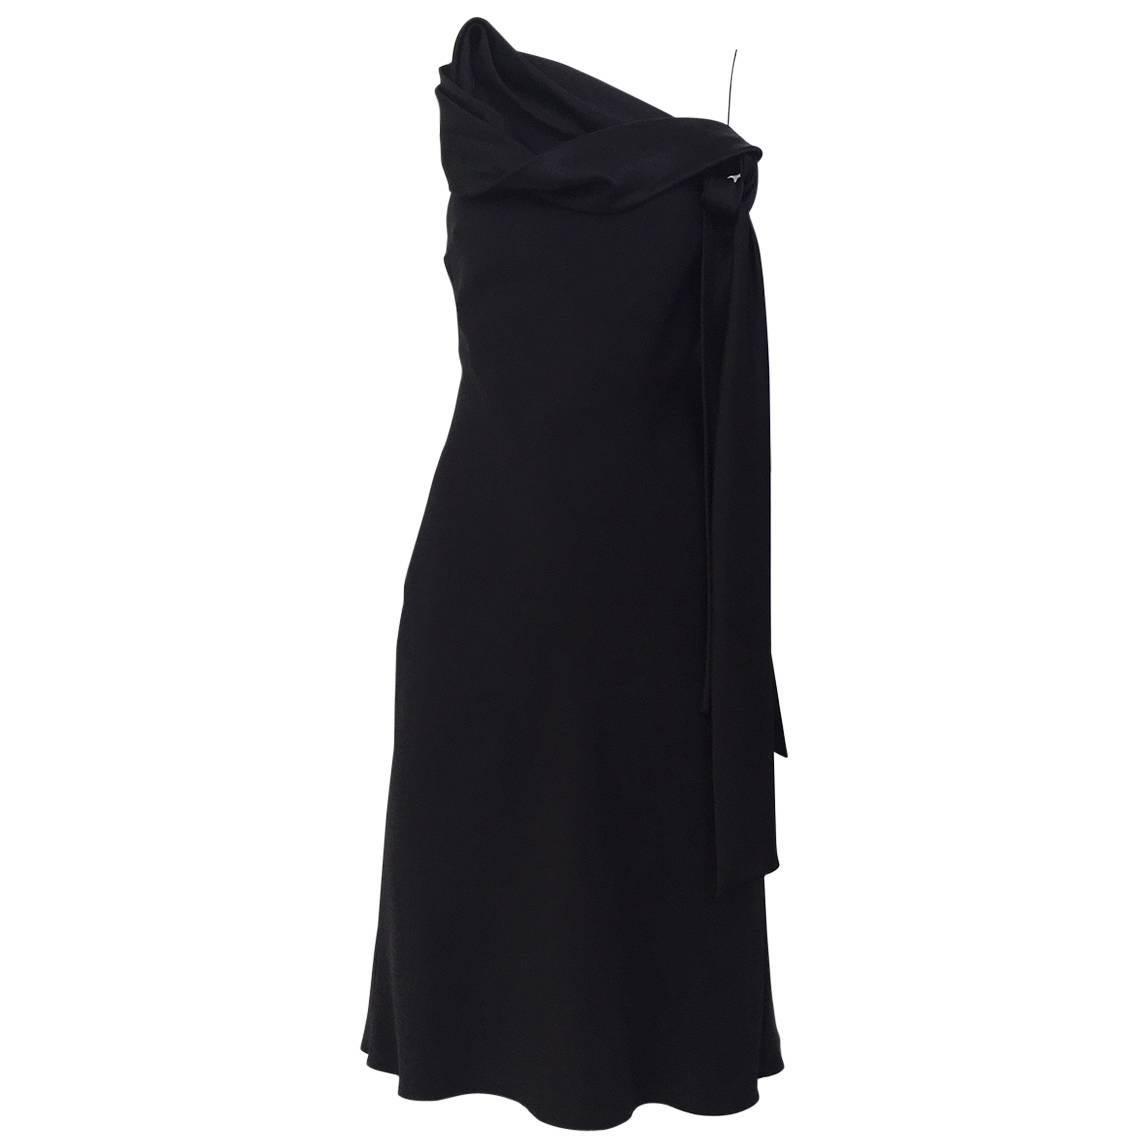 90s John Galliano black knot satin slip dress